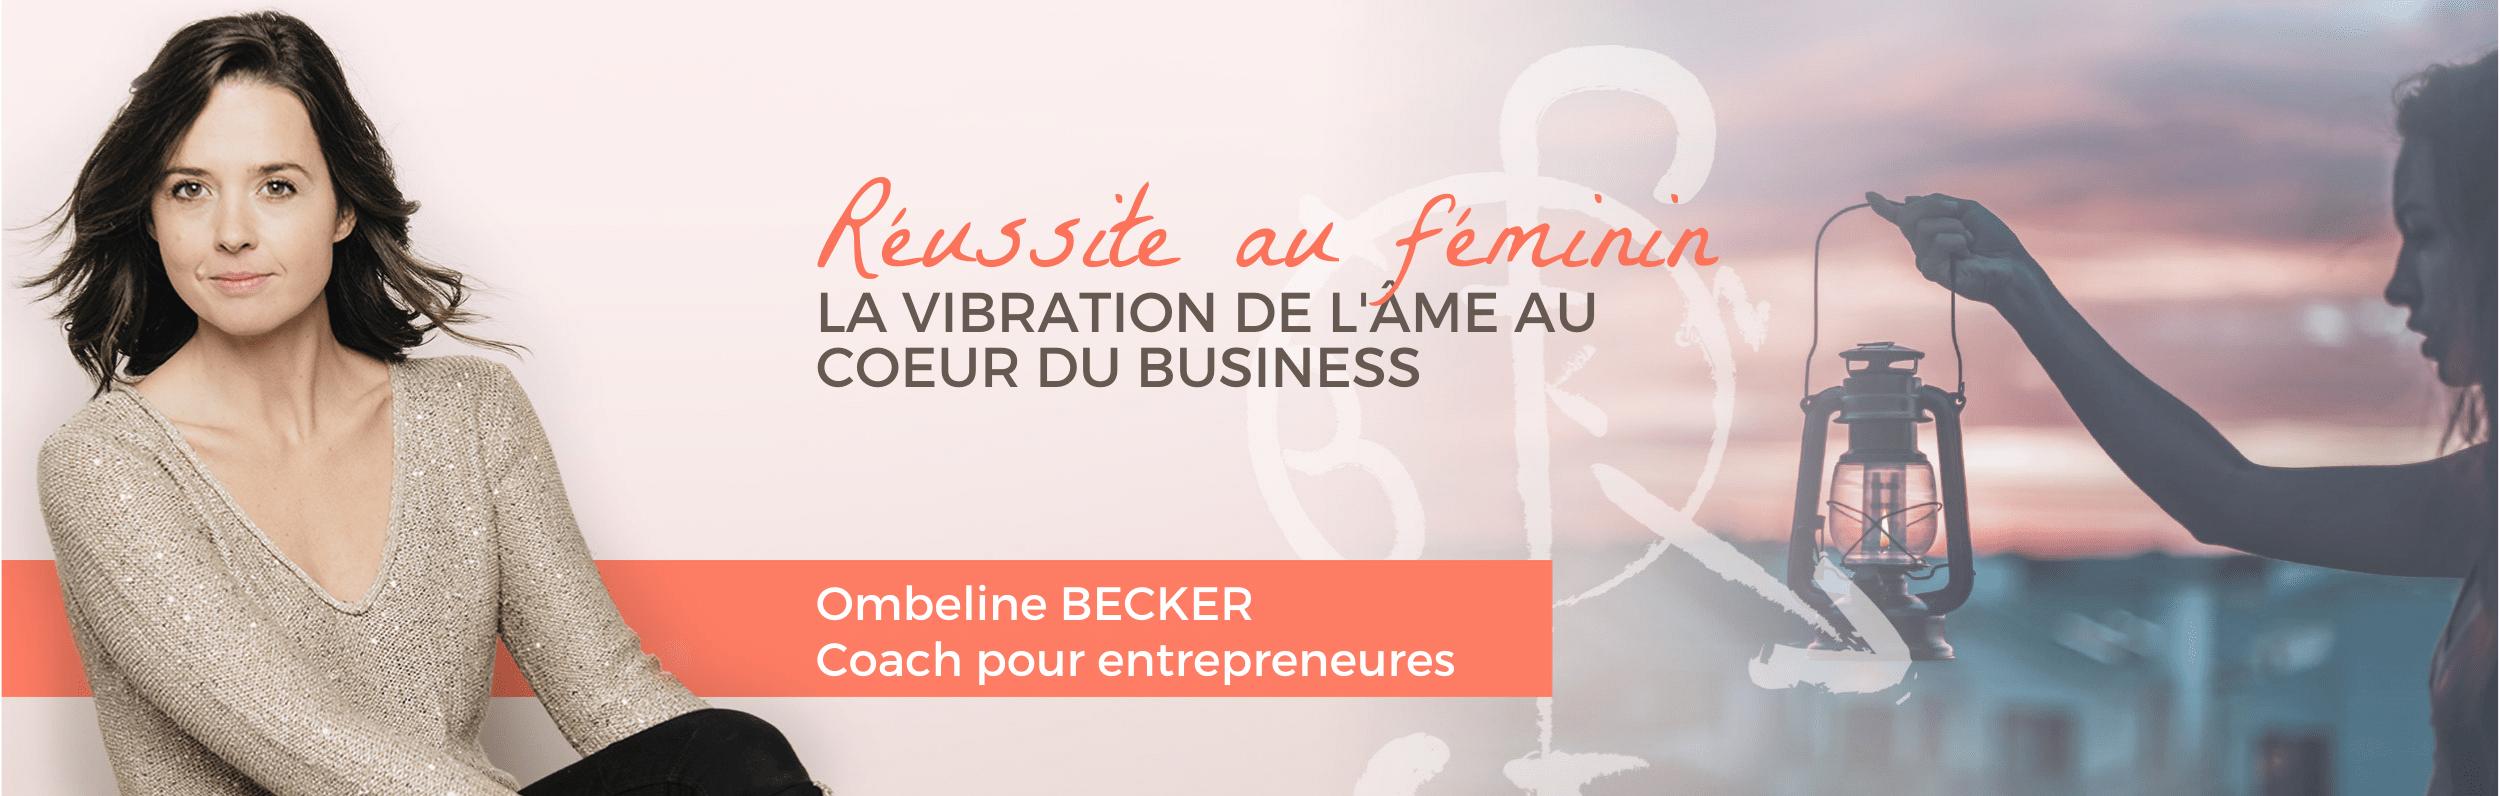 ombeline becker reussite au feminin coach pour entrepreneures